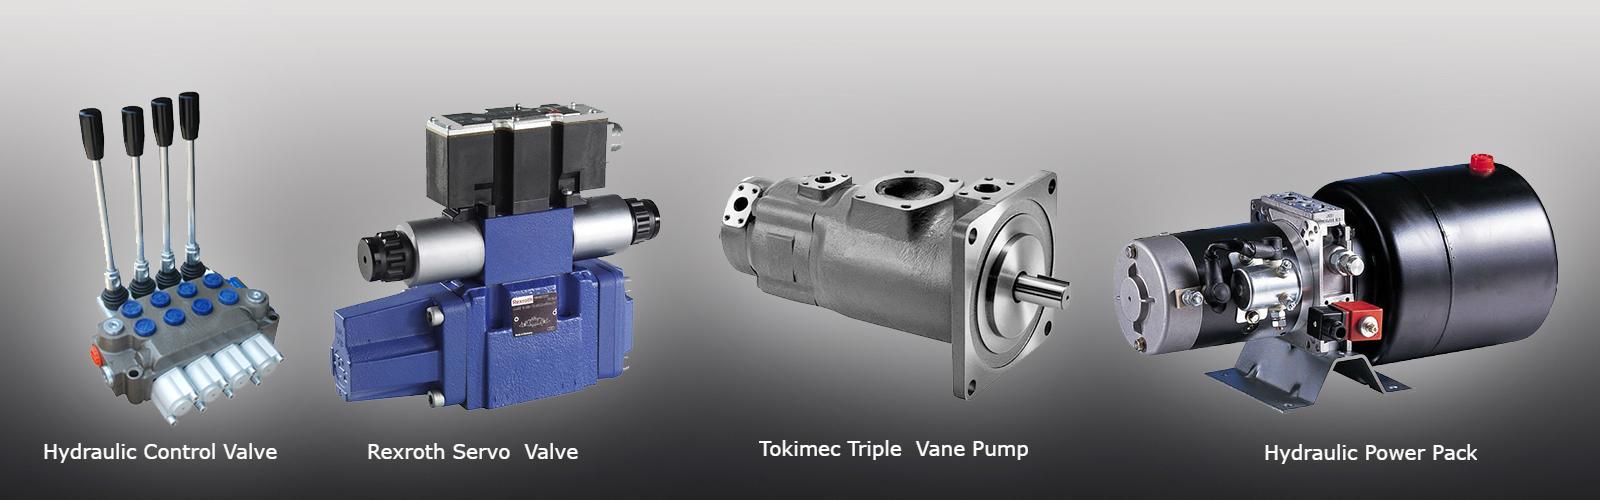 Control Valve, Servo Valve, Vane Pump and Power Pack